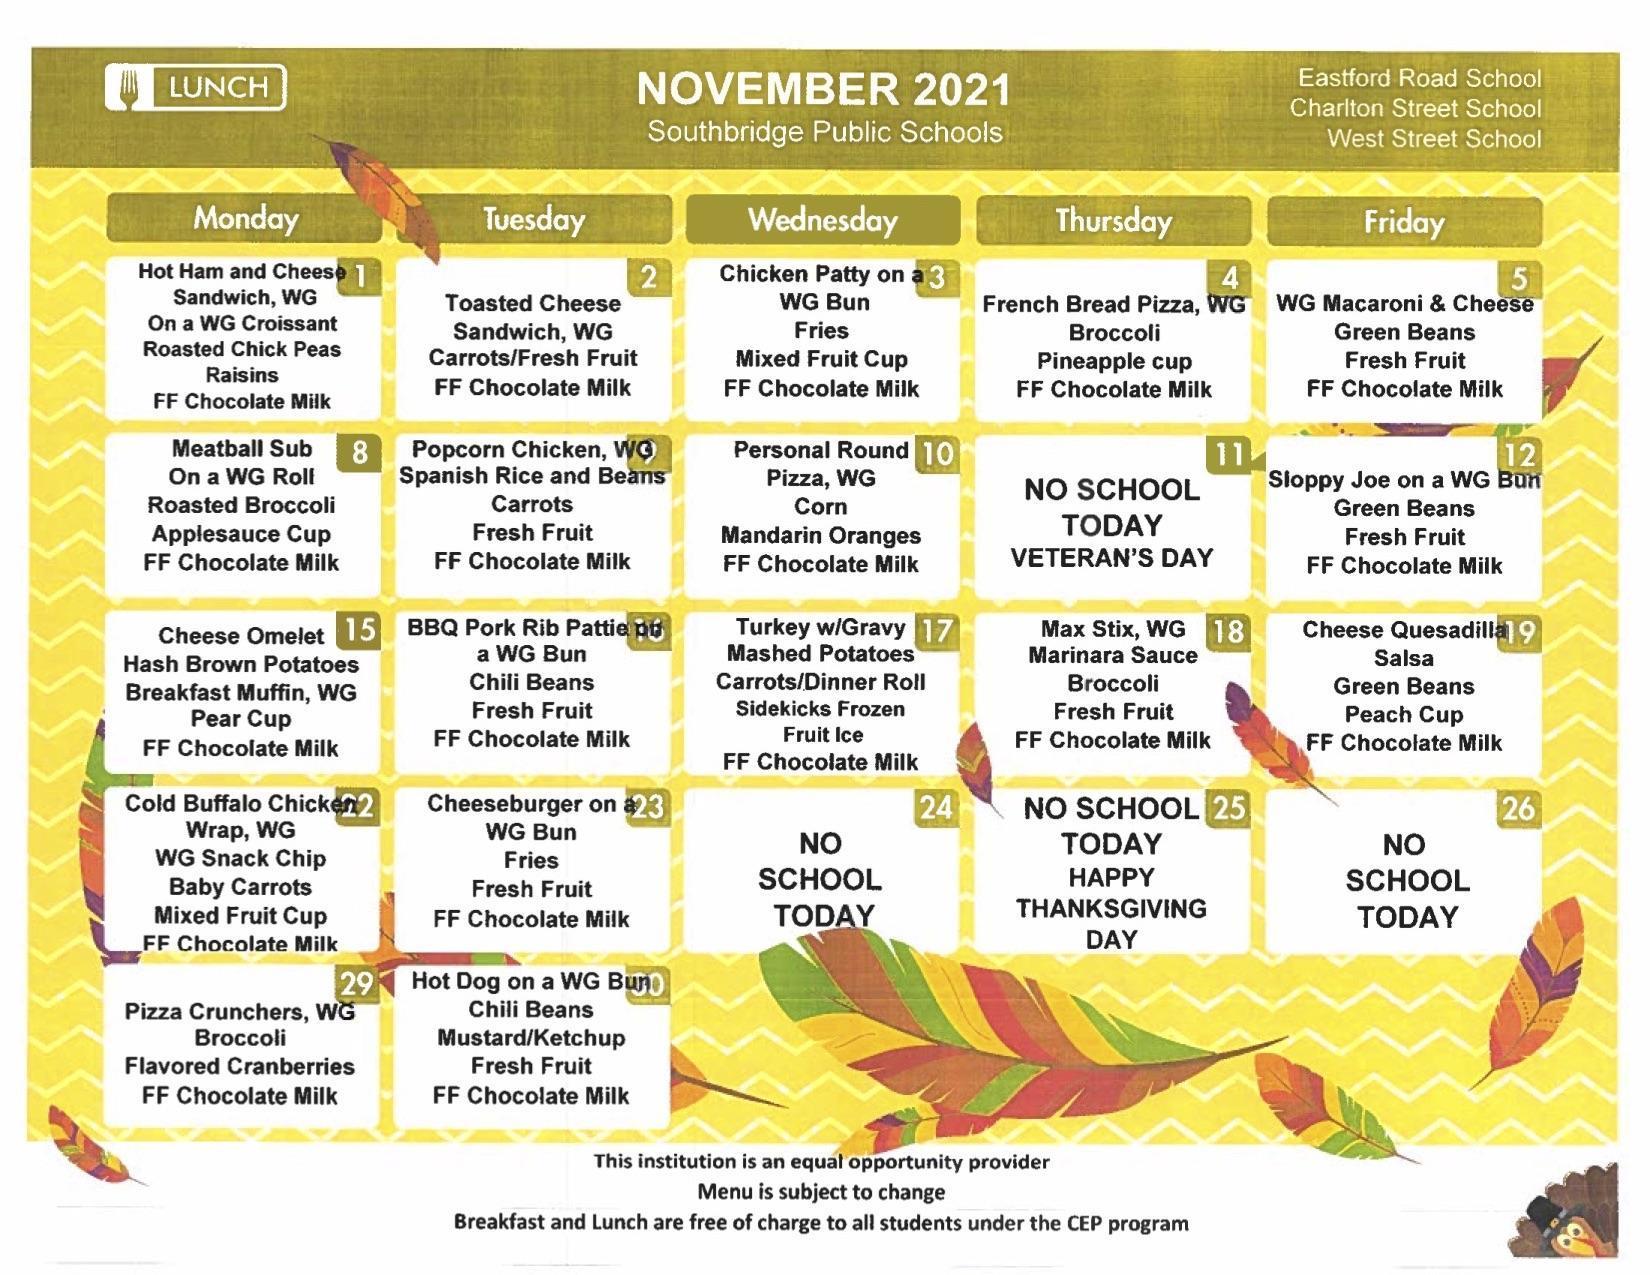 Elementary schools menu November 2021